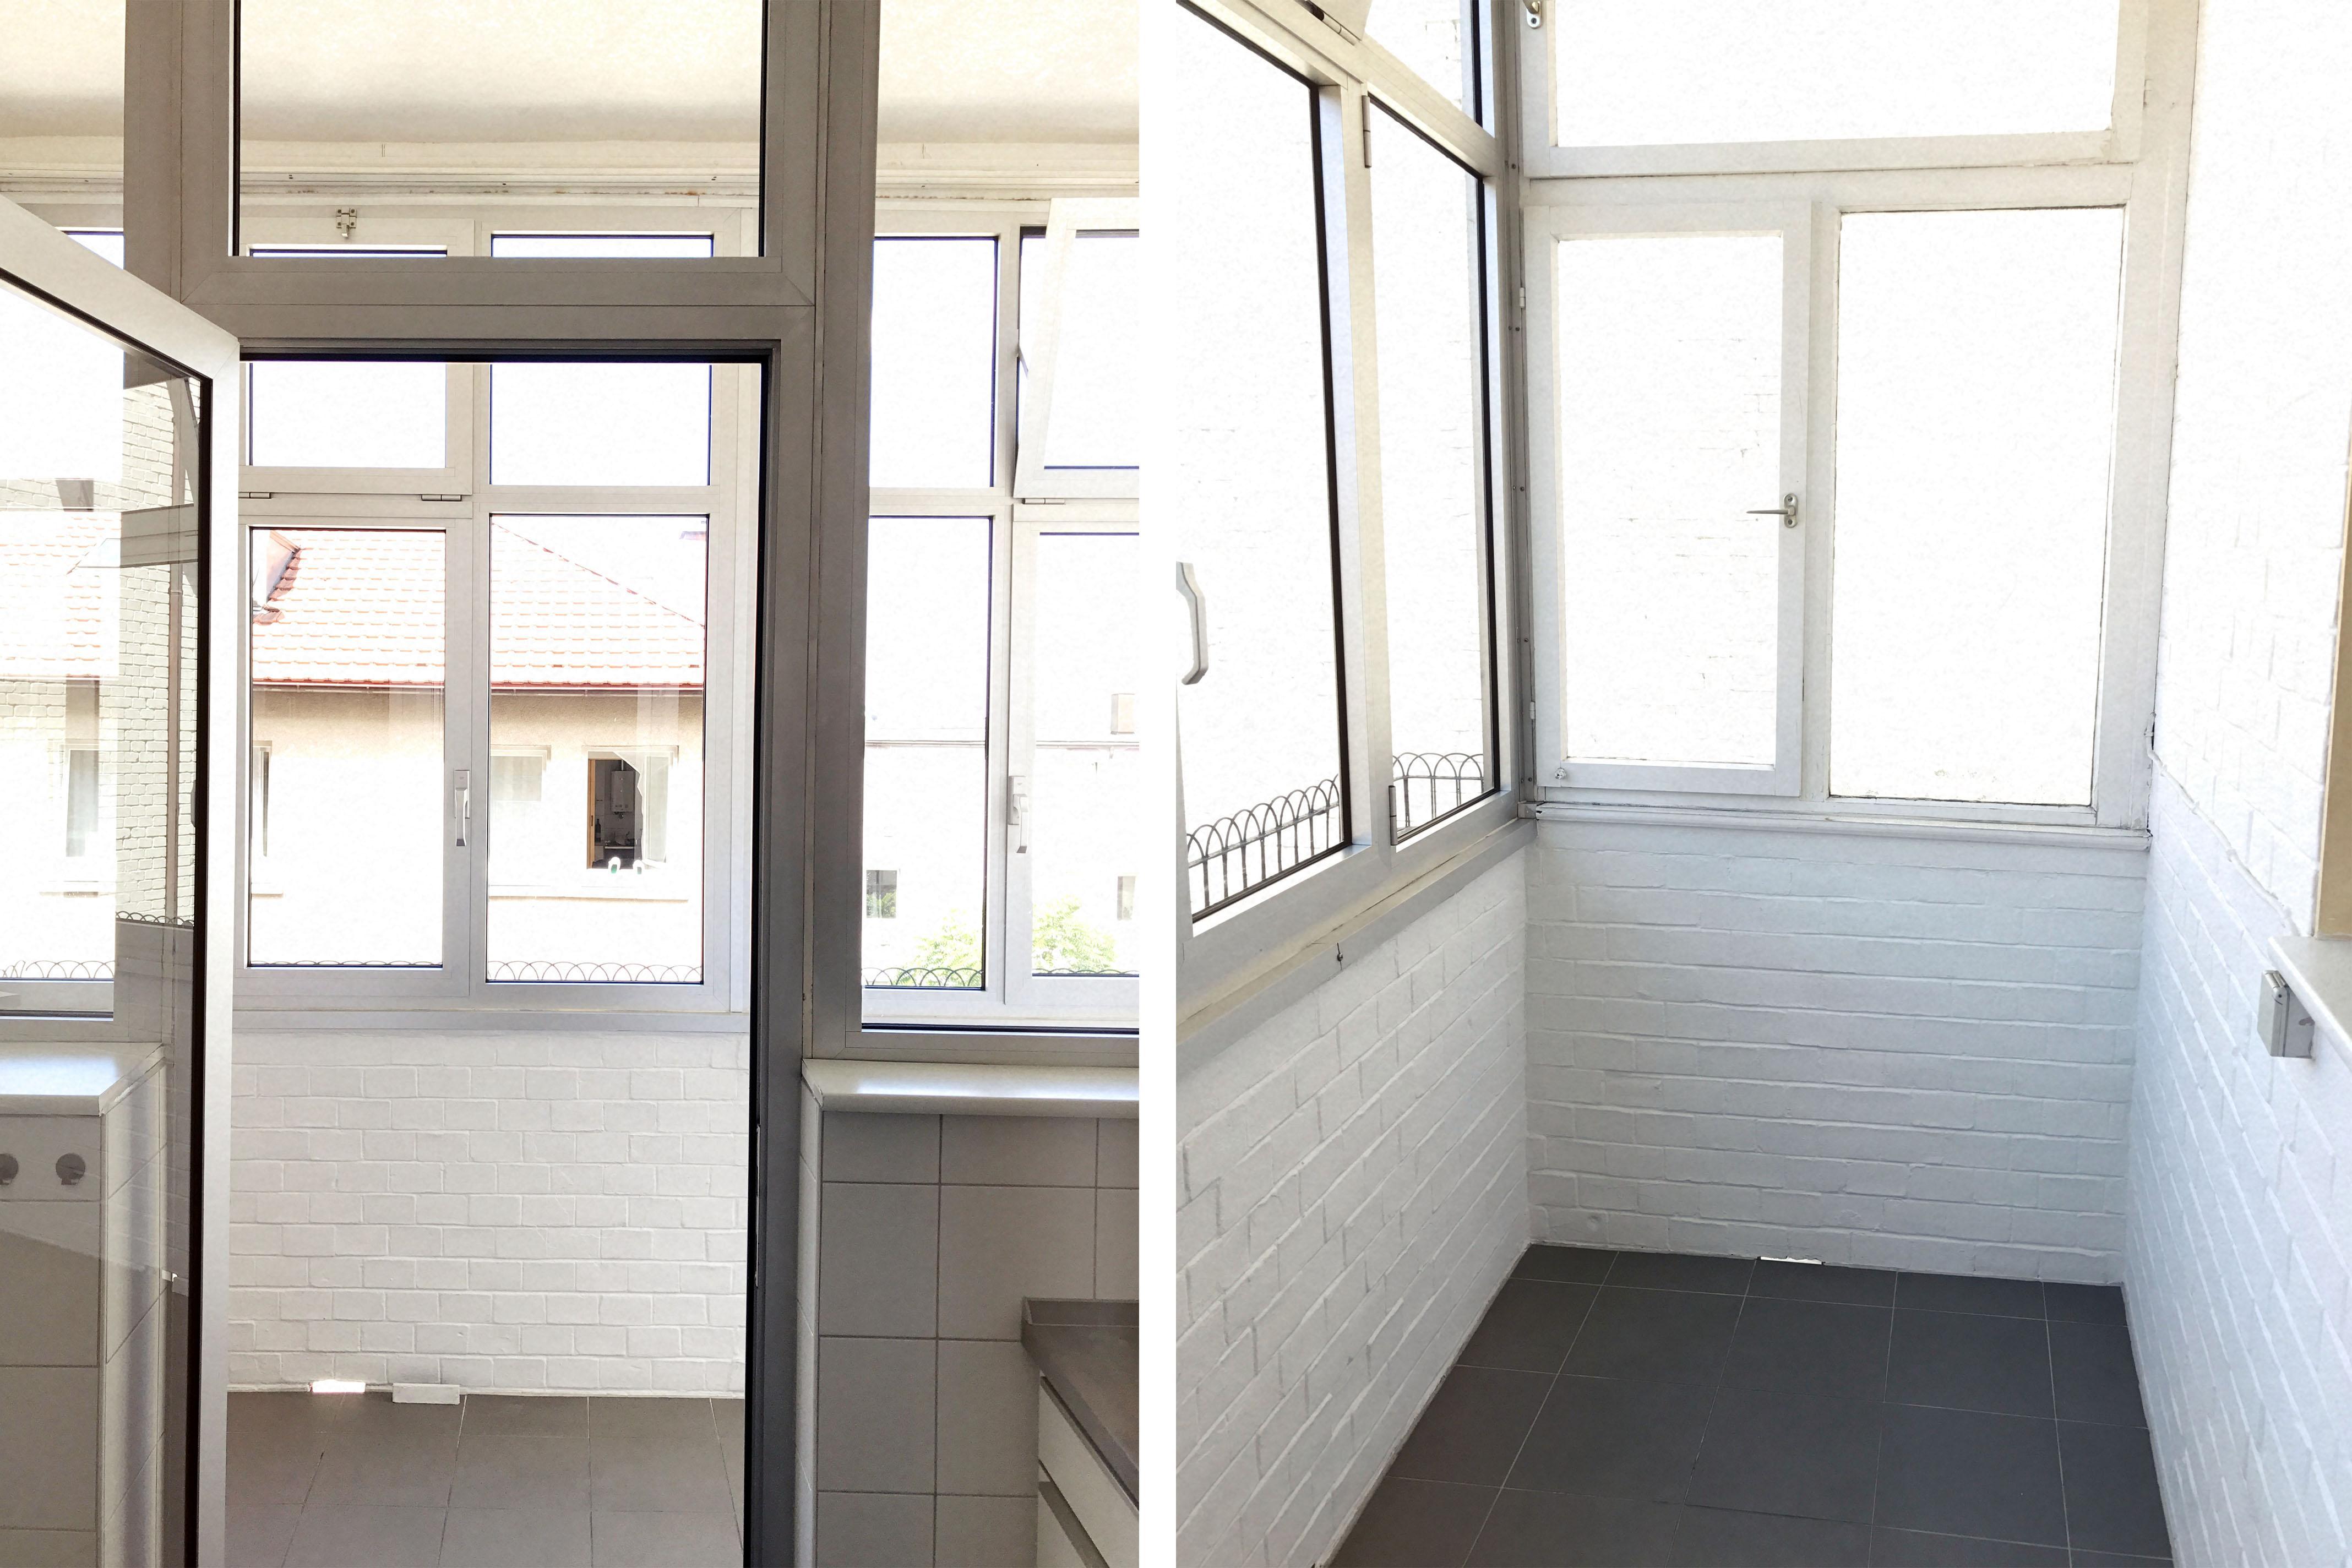 Neue Wohnung Stuttgart Altbau Ost Veranda Balkon Verglast Do Live